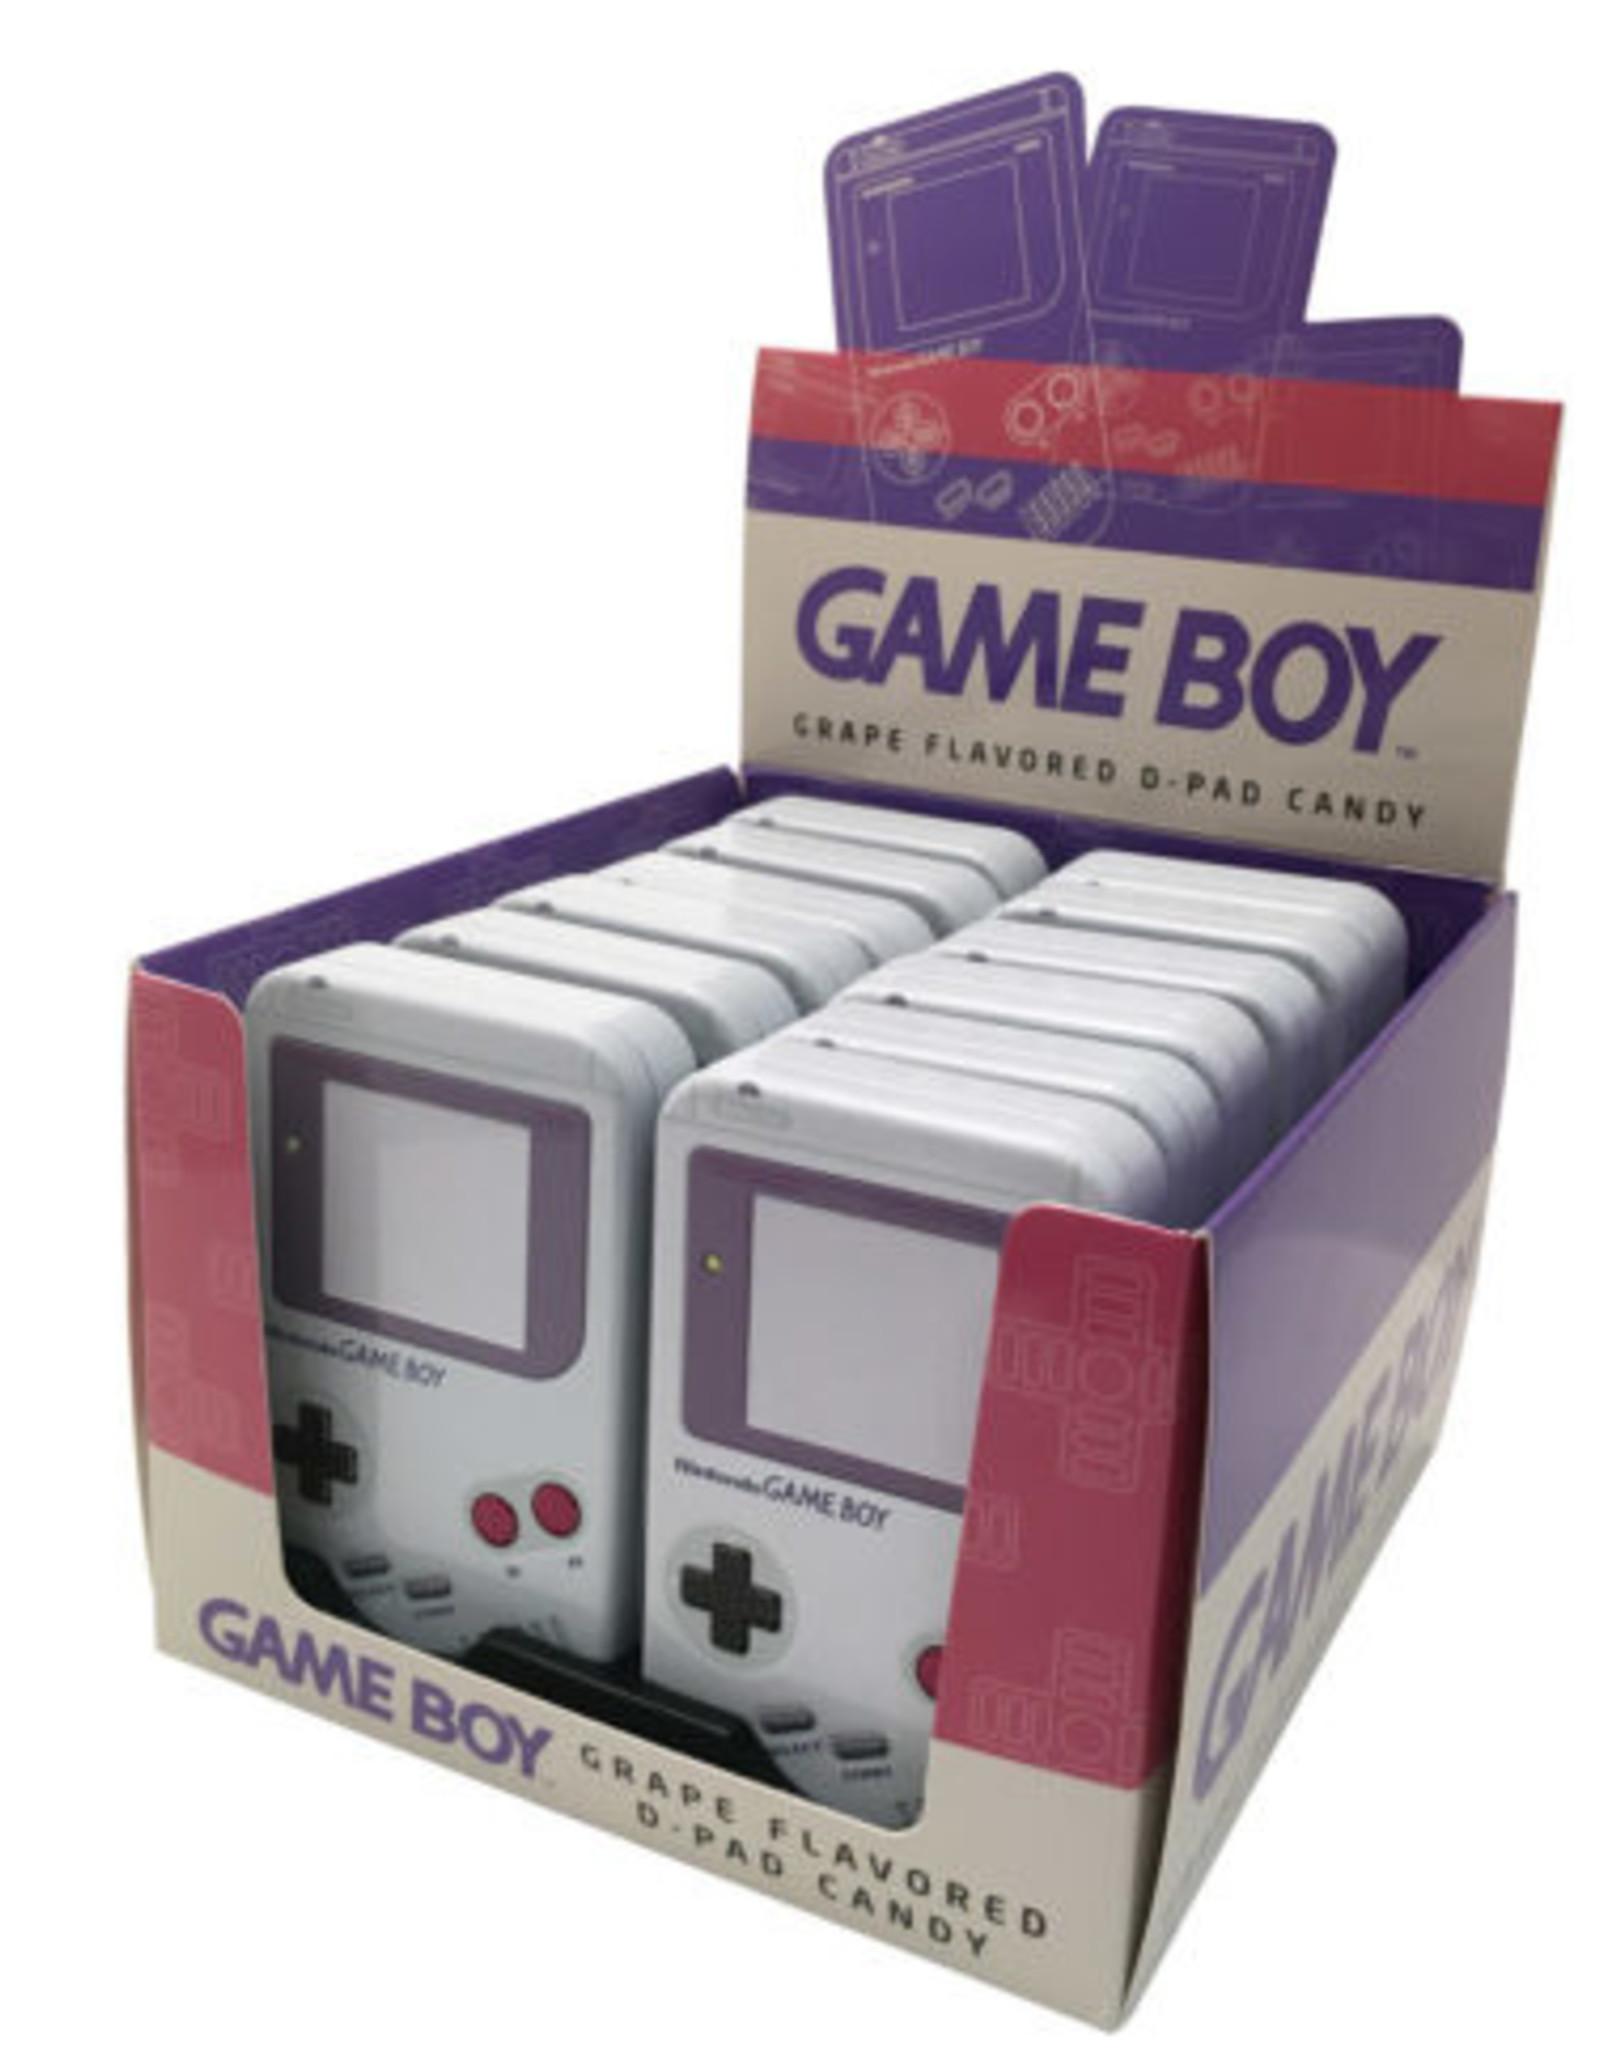 Game Boy Candy